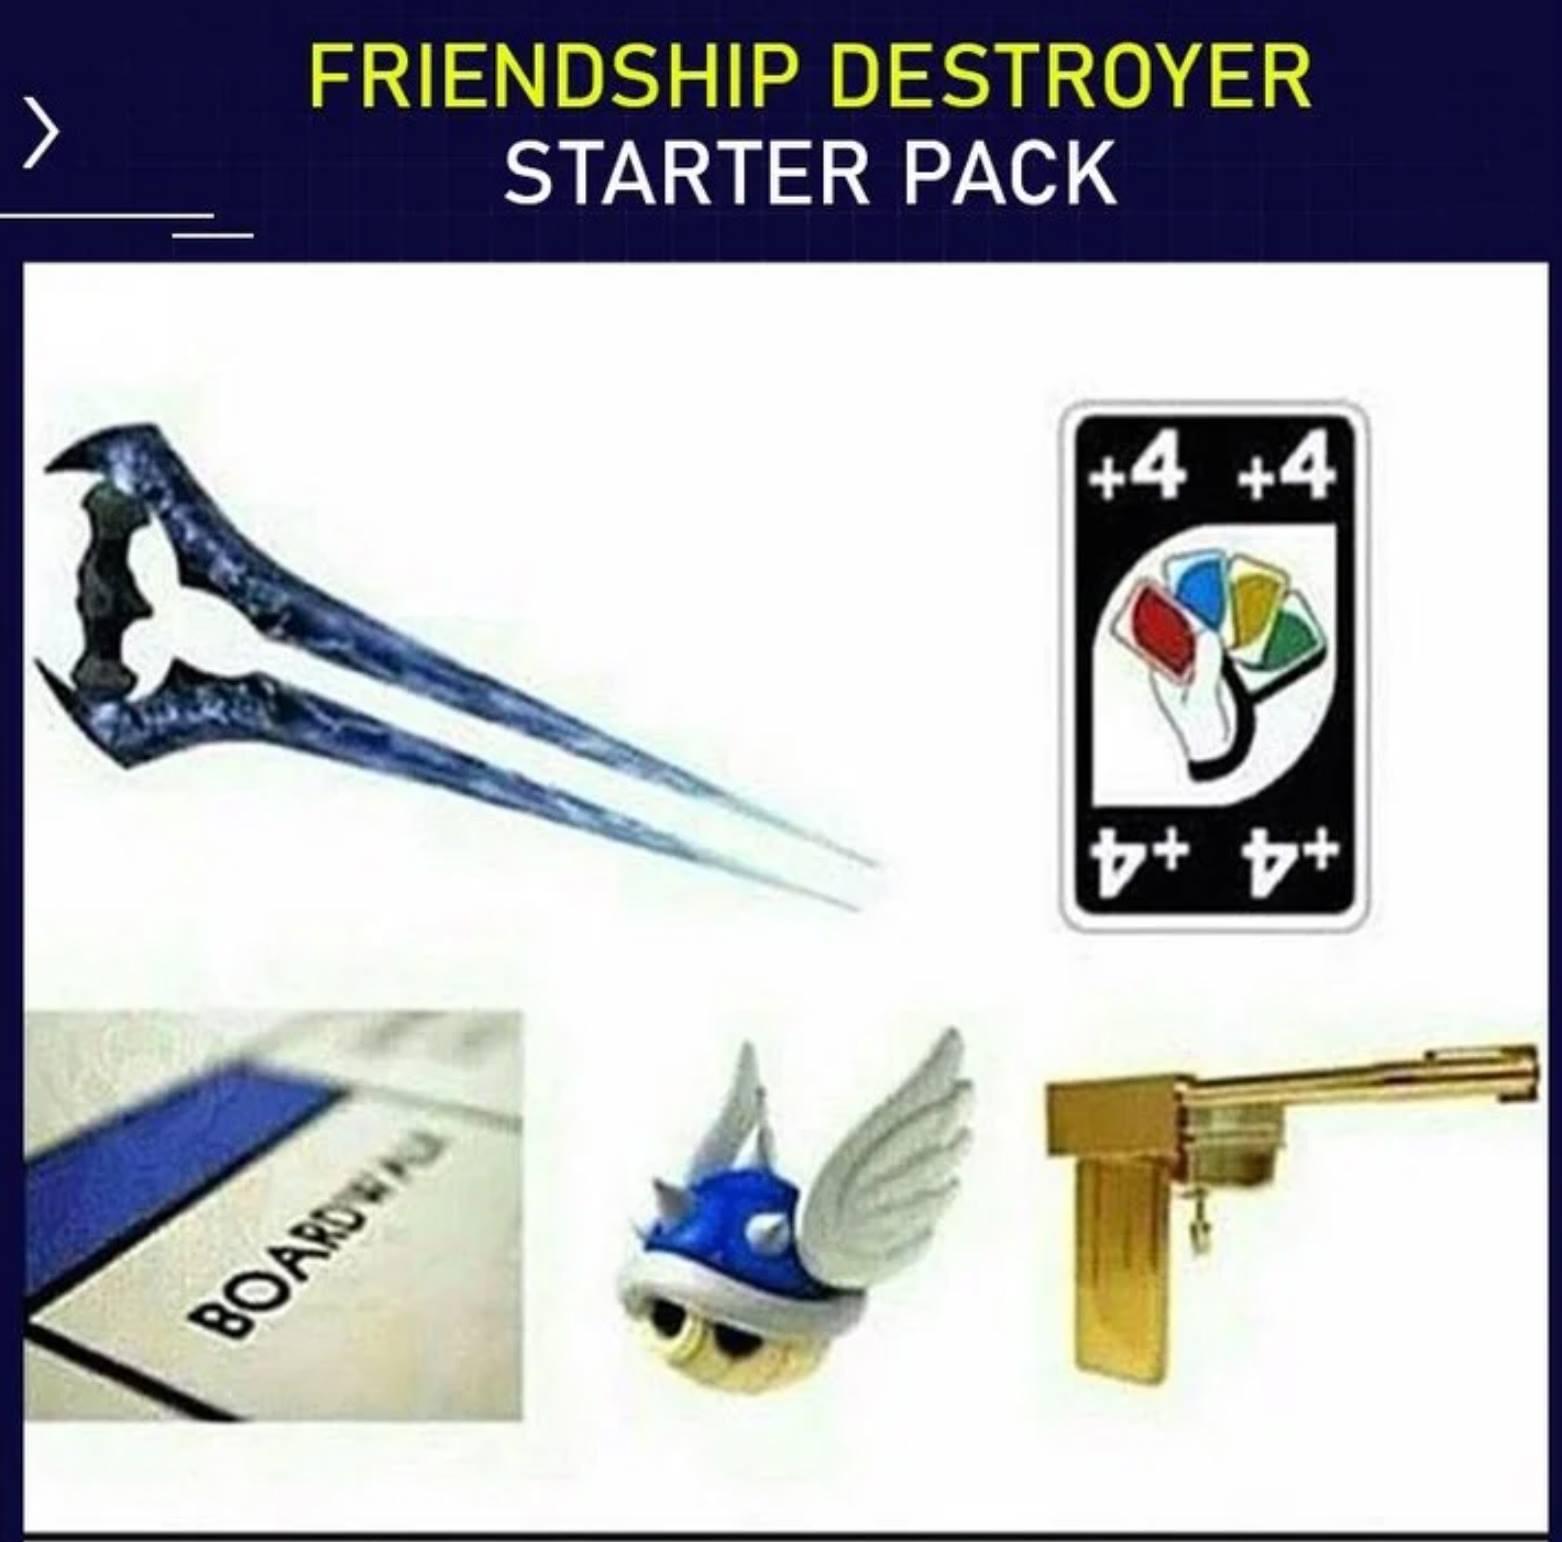 Memes Friendship destroyer starter pack halo energy sword +4 card Uno boardwalk monopoly blue shell Mario kart goldeneye 007 Golden gun